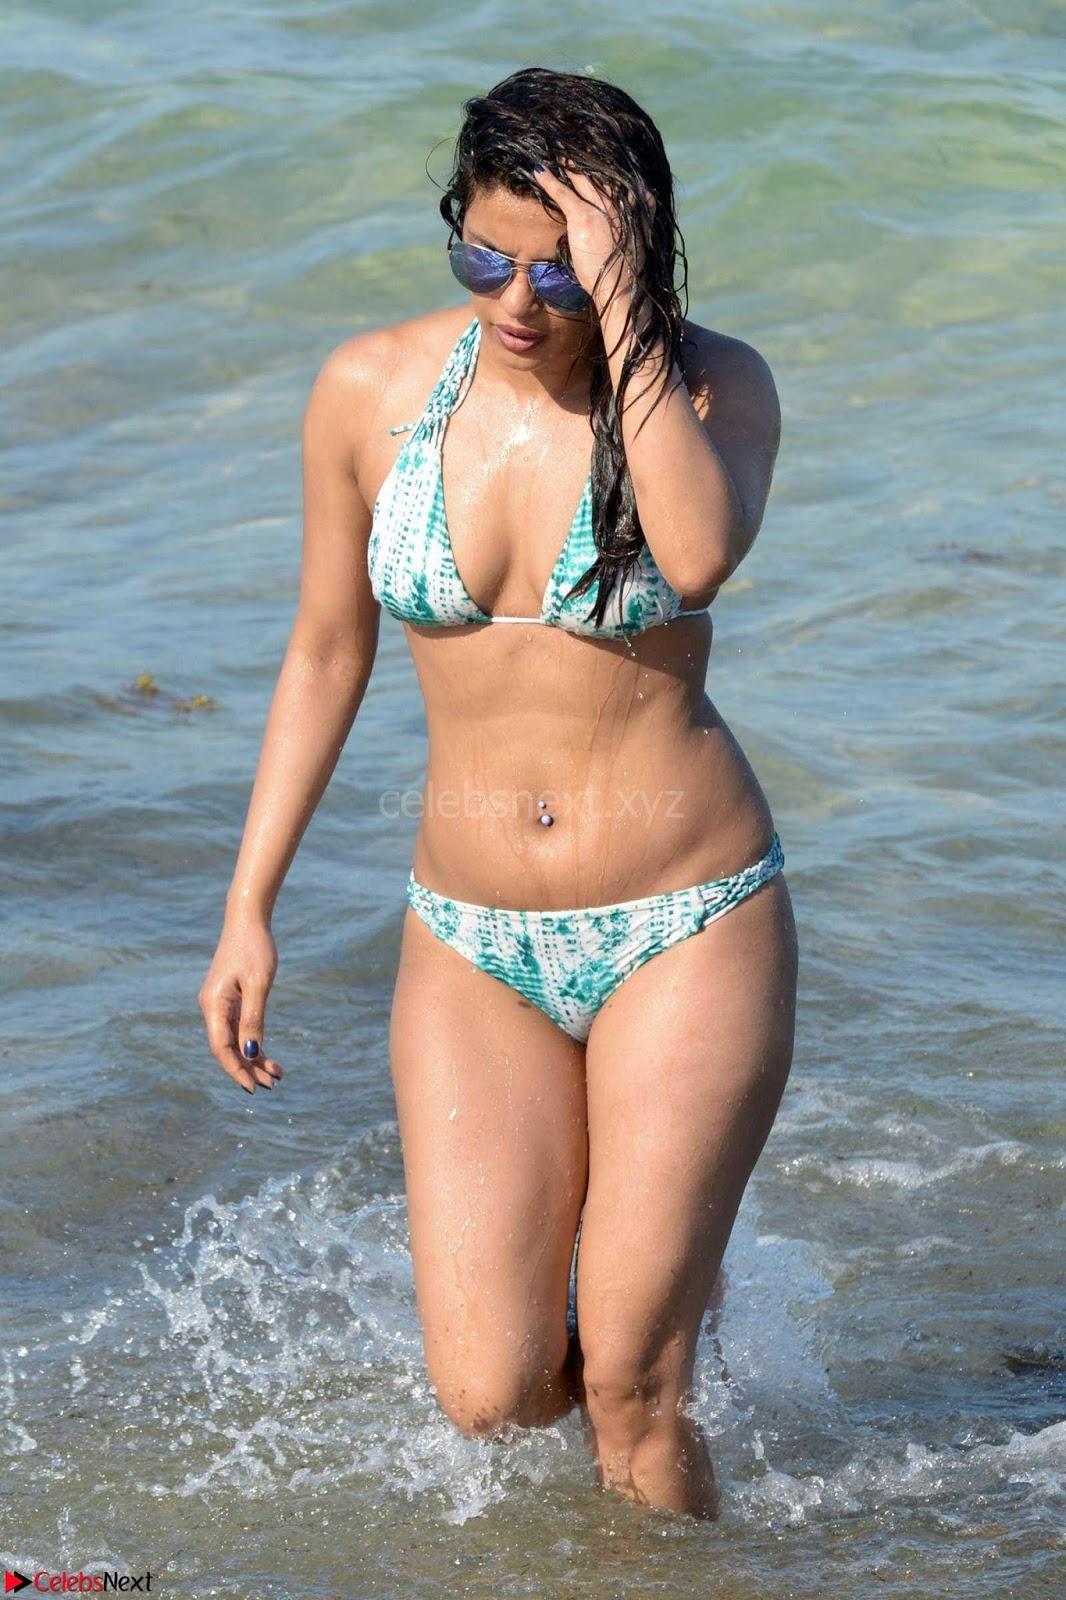 Priyanka Chopra on beach in White and green Bikini Enjoying Miami Day 5 ~ CelebsNext Exclusive